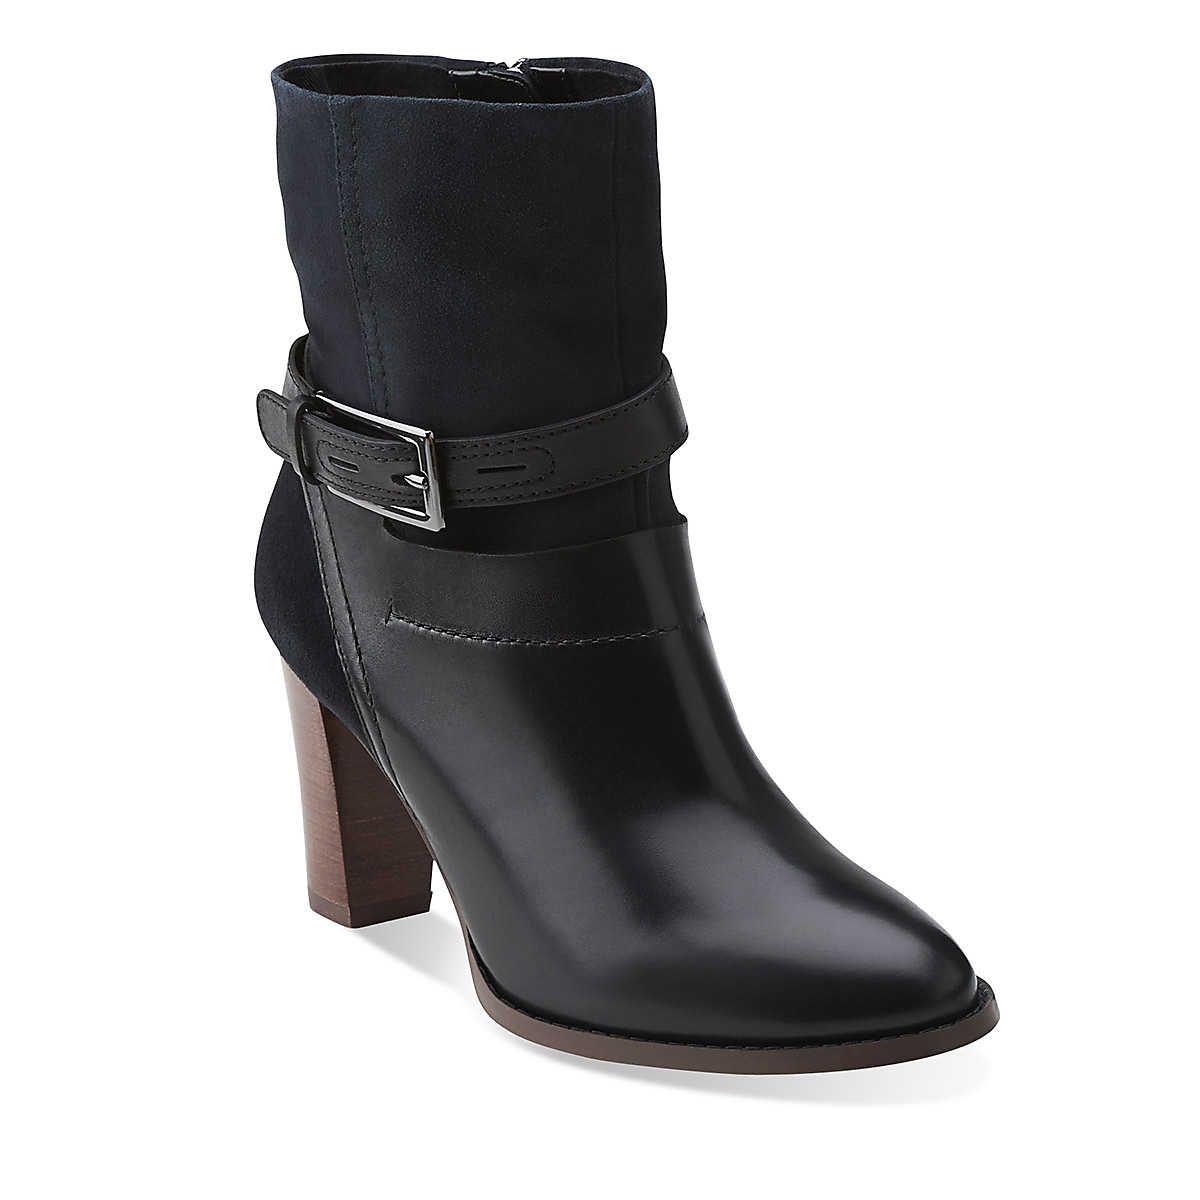 Womens Boots Clarks Kacia Garnet Black Leather/Navy Suede